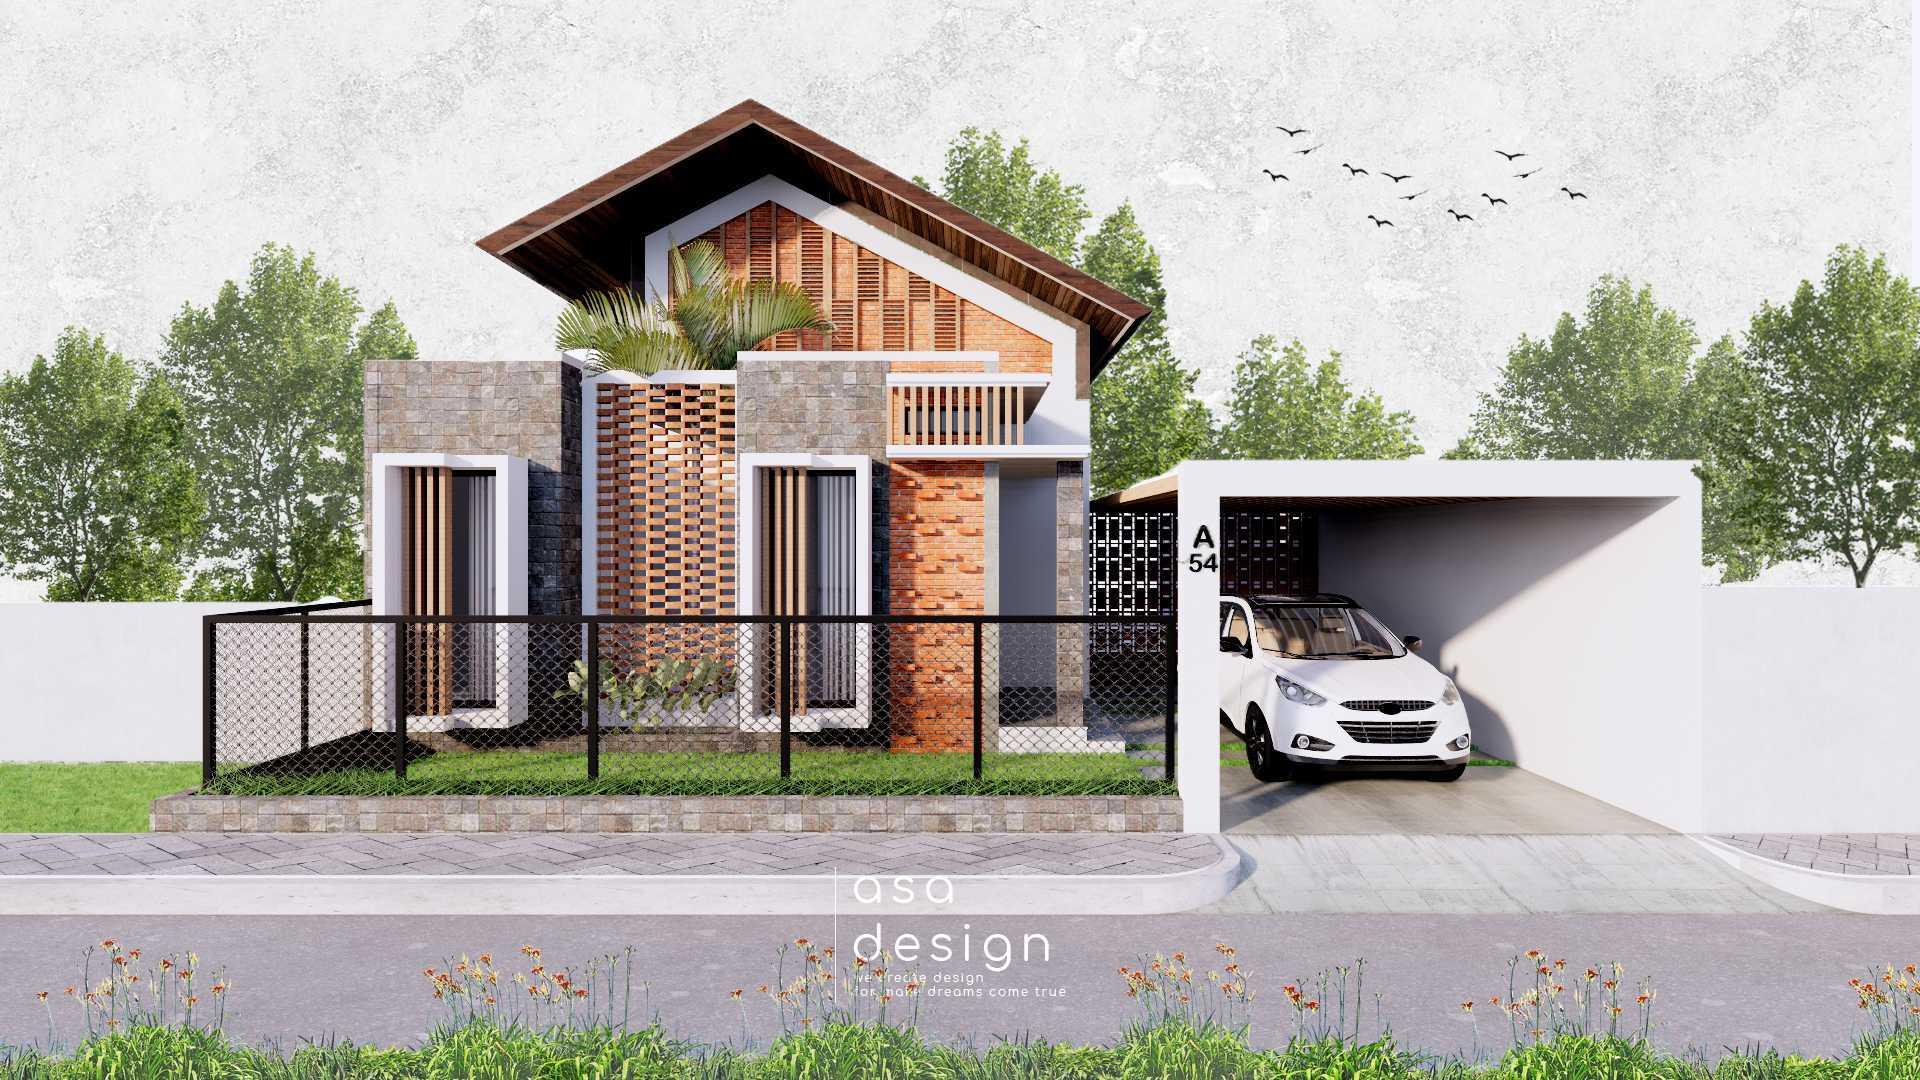 Asa Design Architect Griyotropis Kabupaten Jombang, Jawa Timur, Indonesia Kabupaten Jombang, Jawa Timur, Indonesia Asa-Desain-Arsitek-Griyotropis   125310